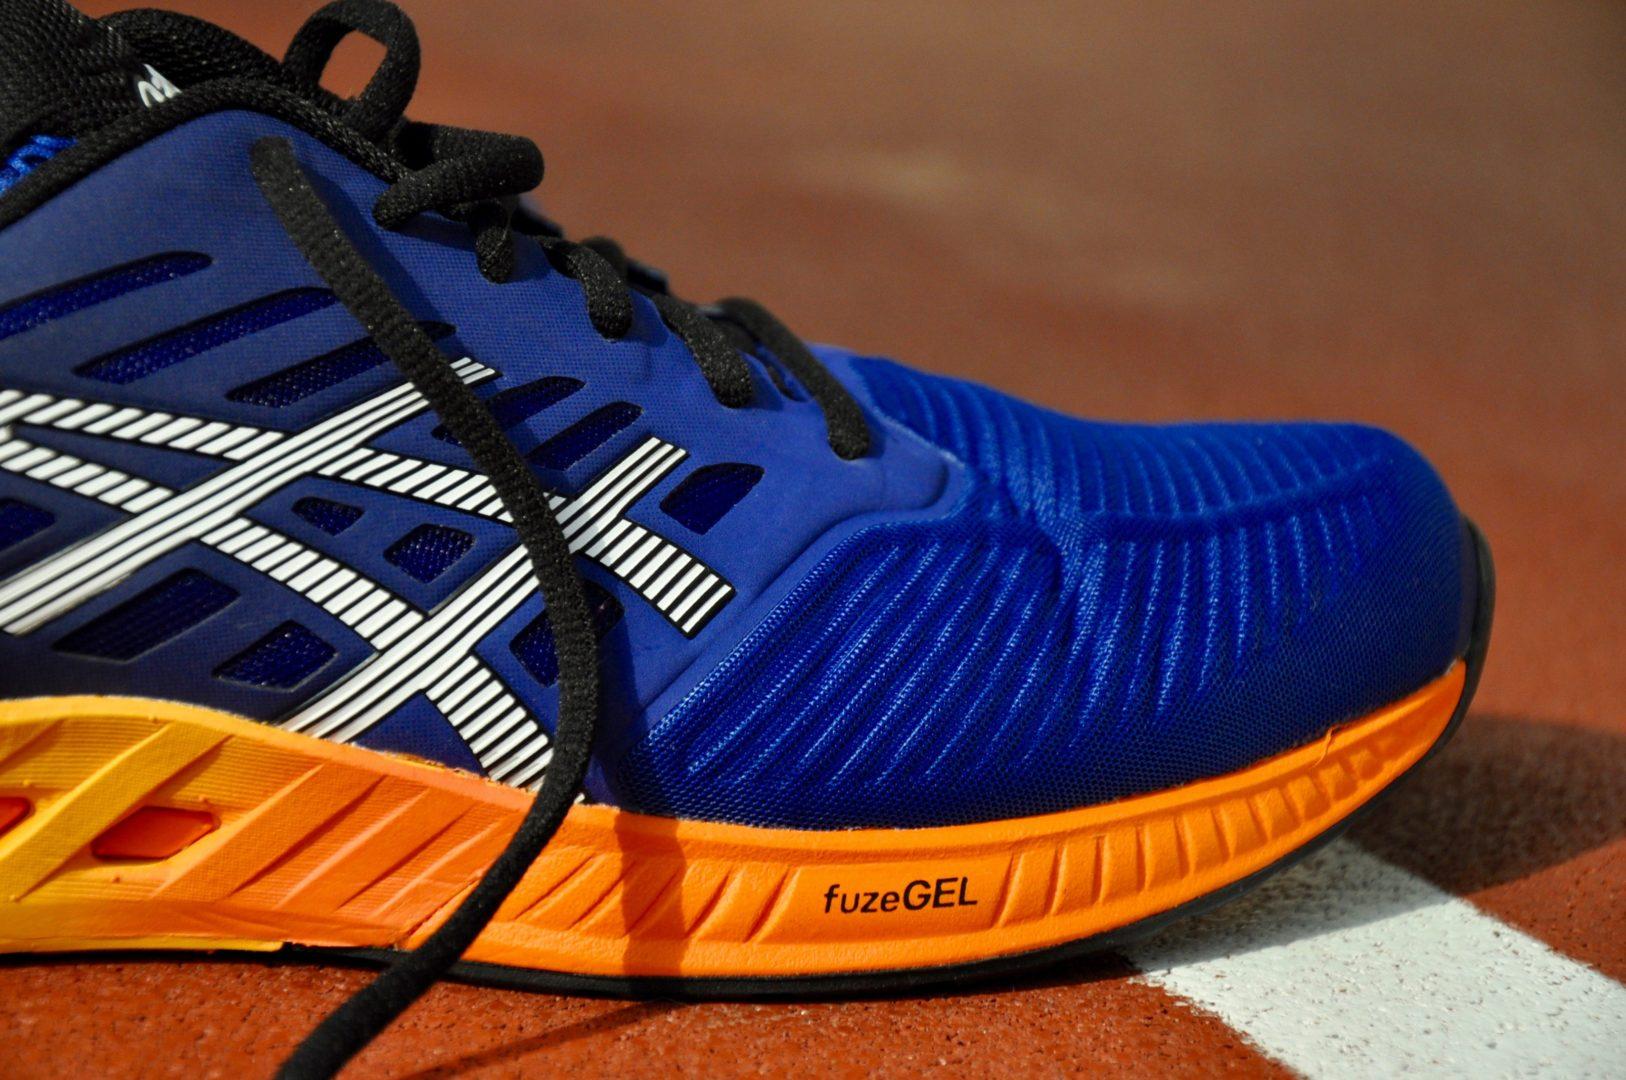 Fuzex Running Asics Achilles Test Laufschuhe US7pqw